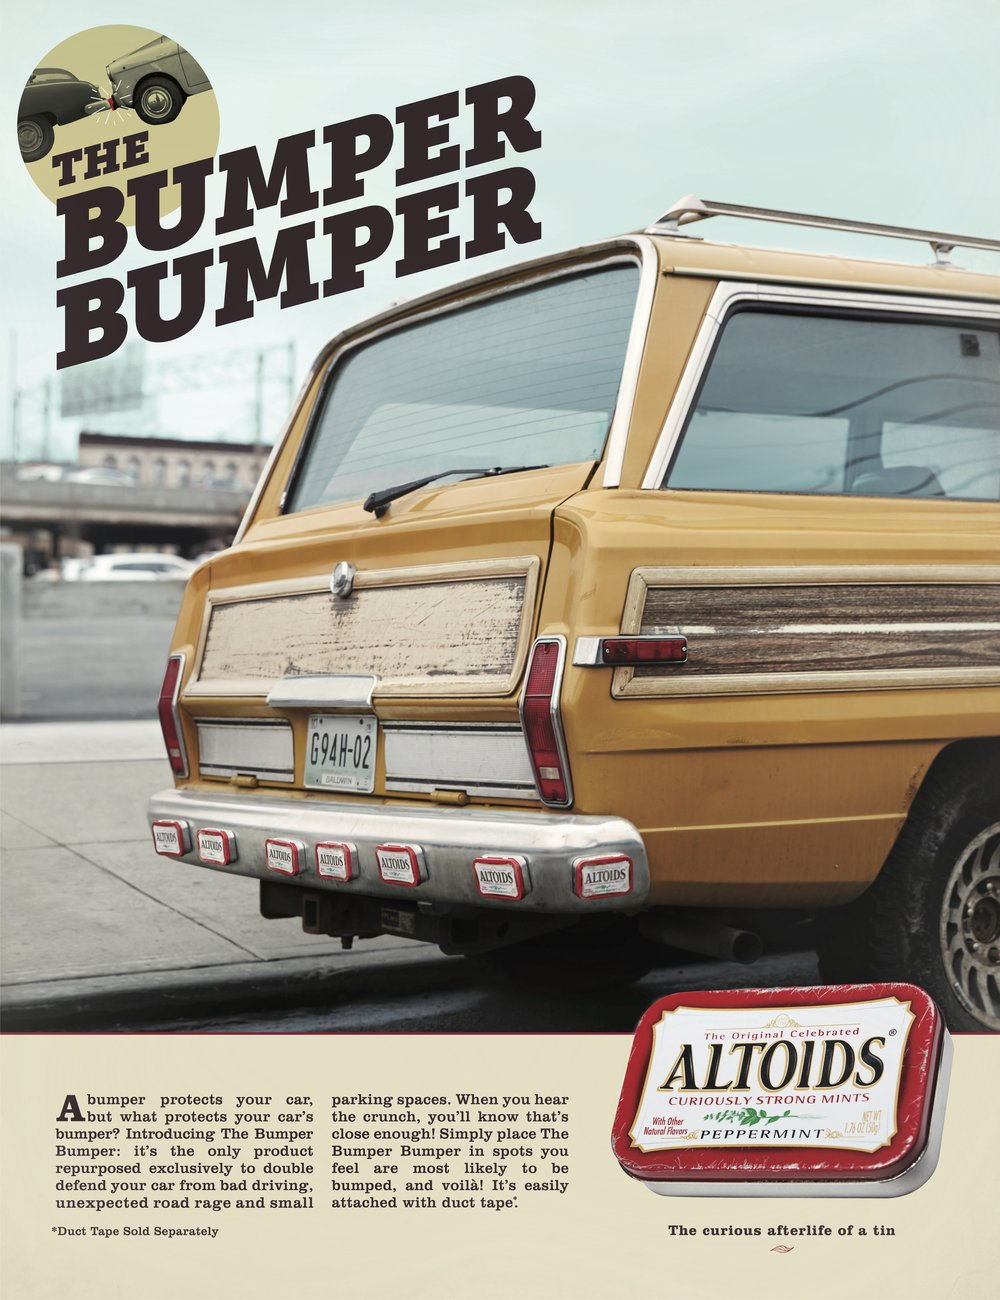 Altoids Bumper_Cannes1.jpg